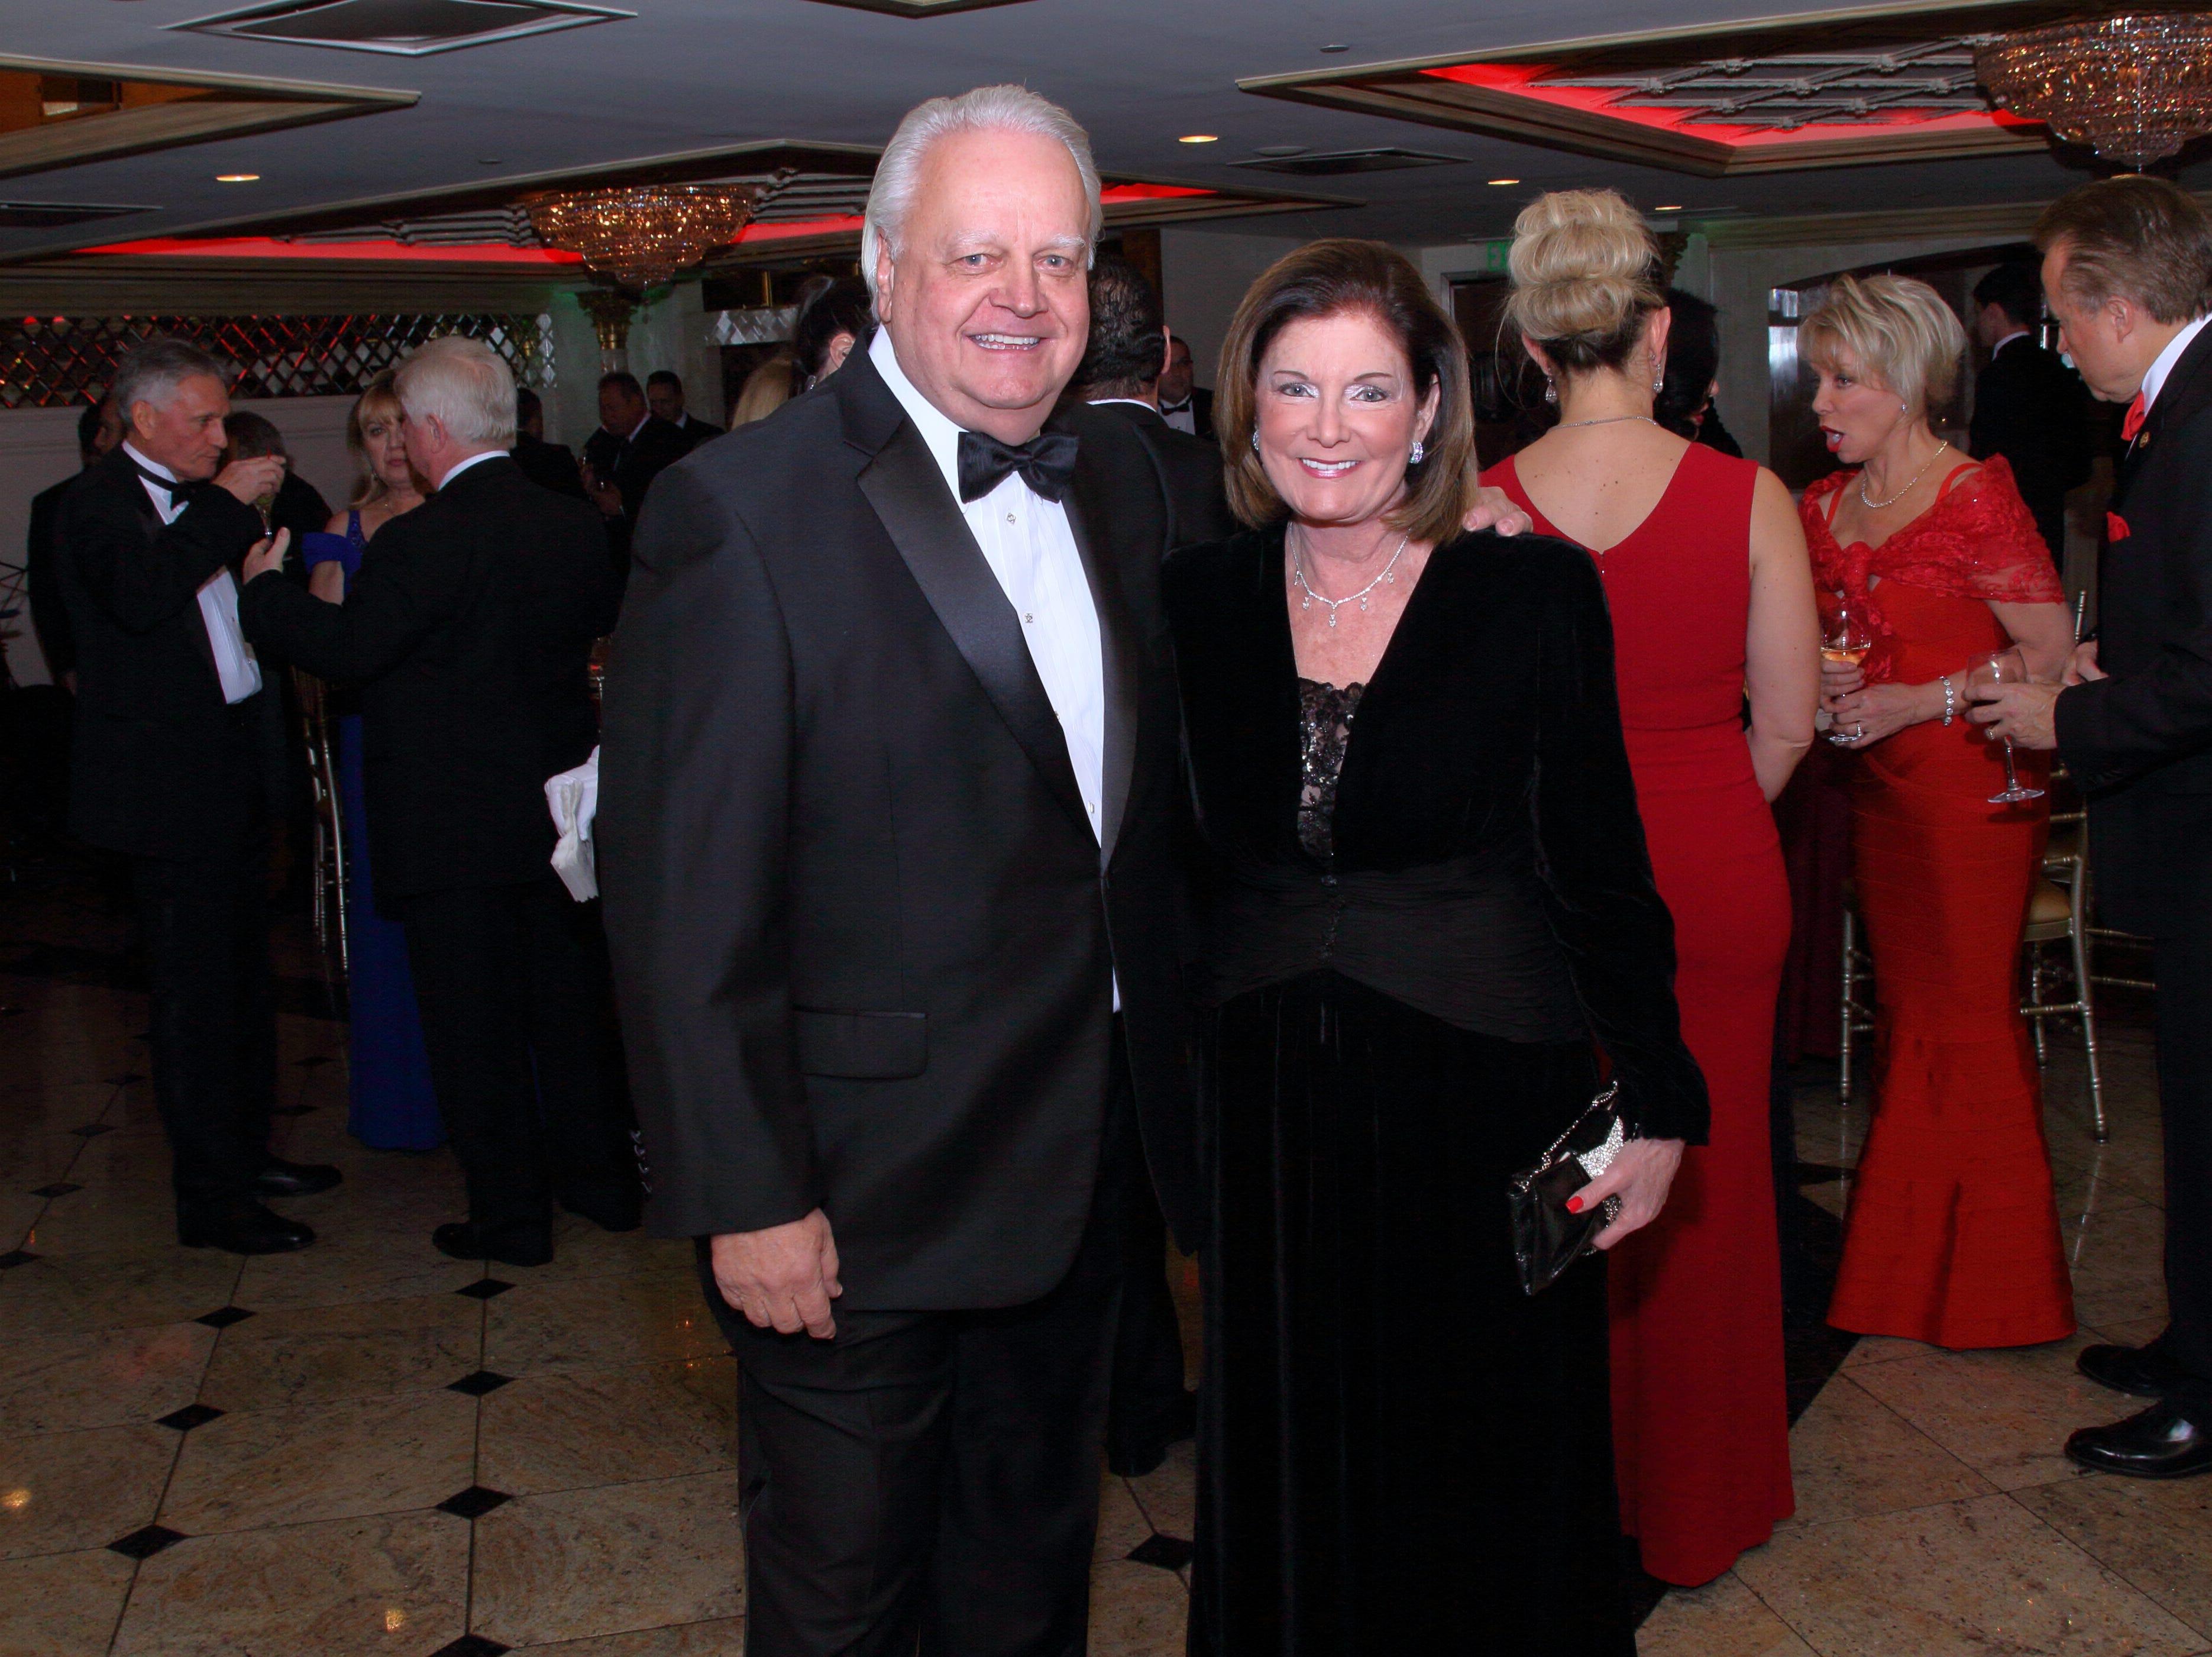 Saddle River Mayor Al Kurpis and his wife Judy Kurpis. The Saddle River Valley Club held its annual Holiday Gala celebration at Seasons in Washington Township. 11/30/2018